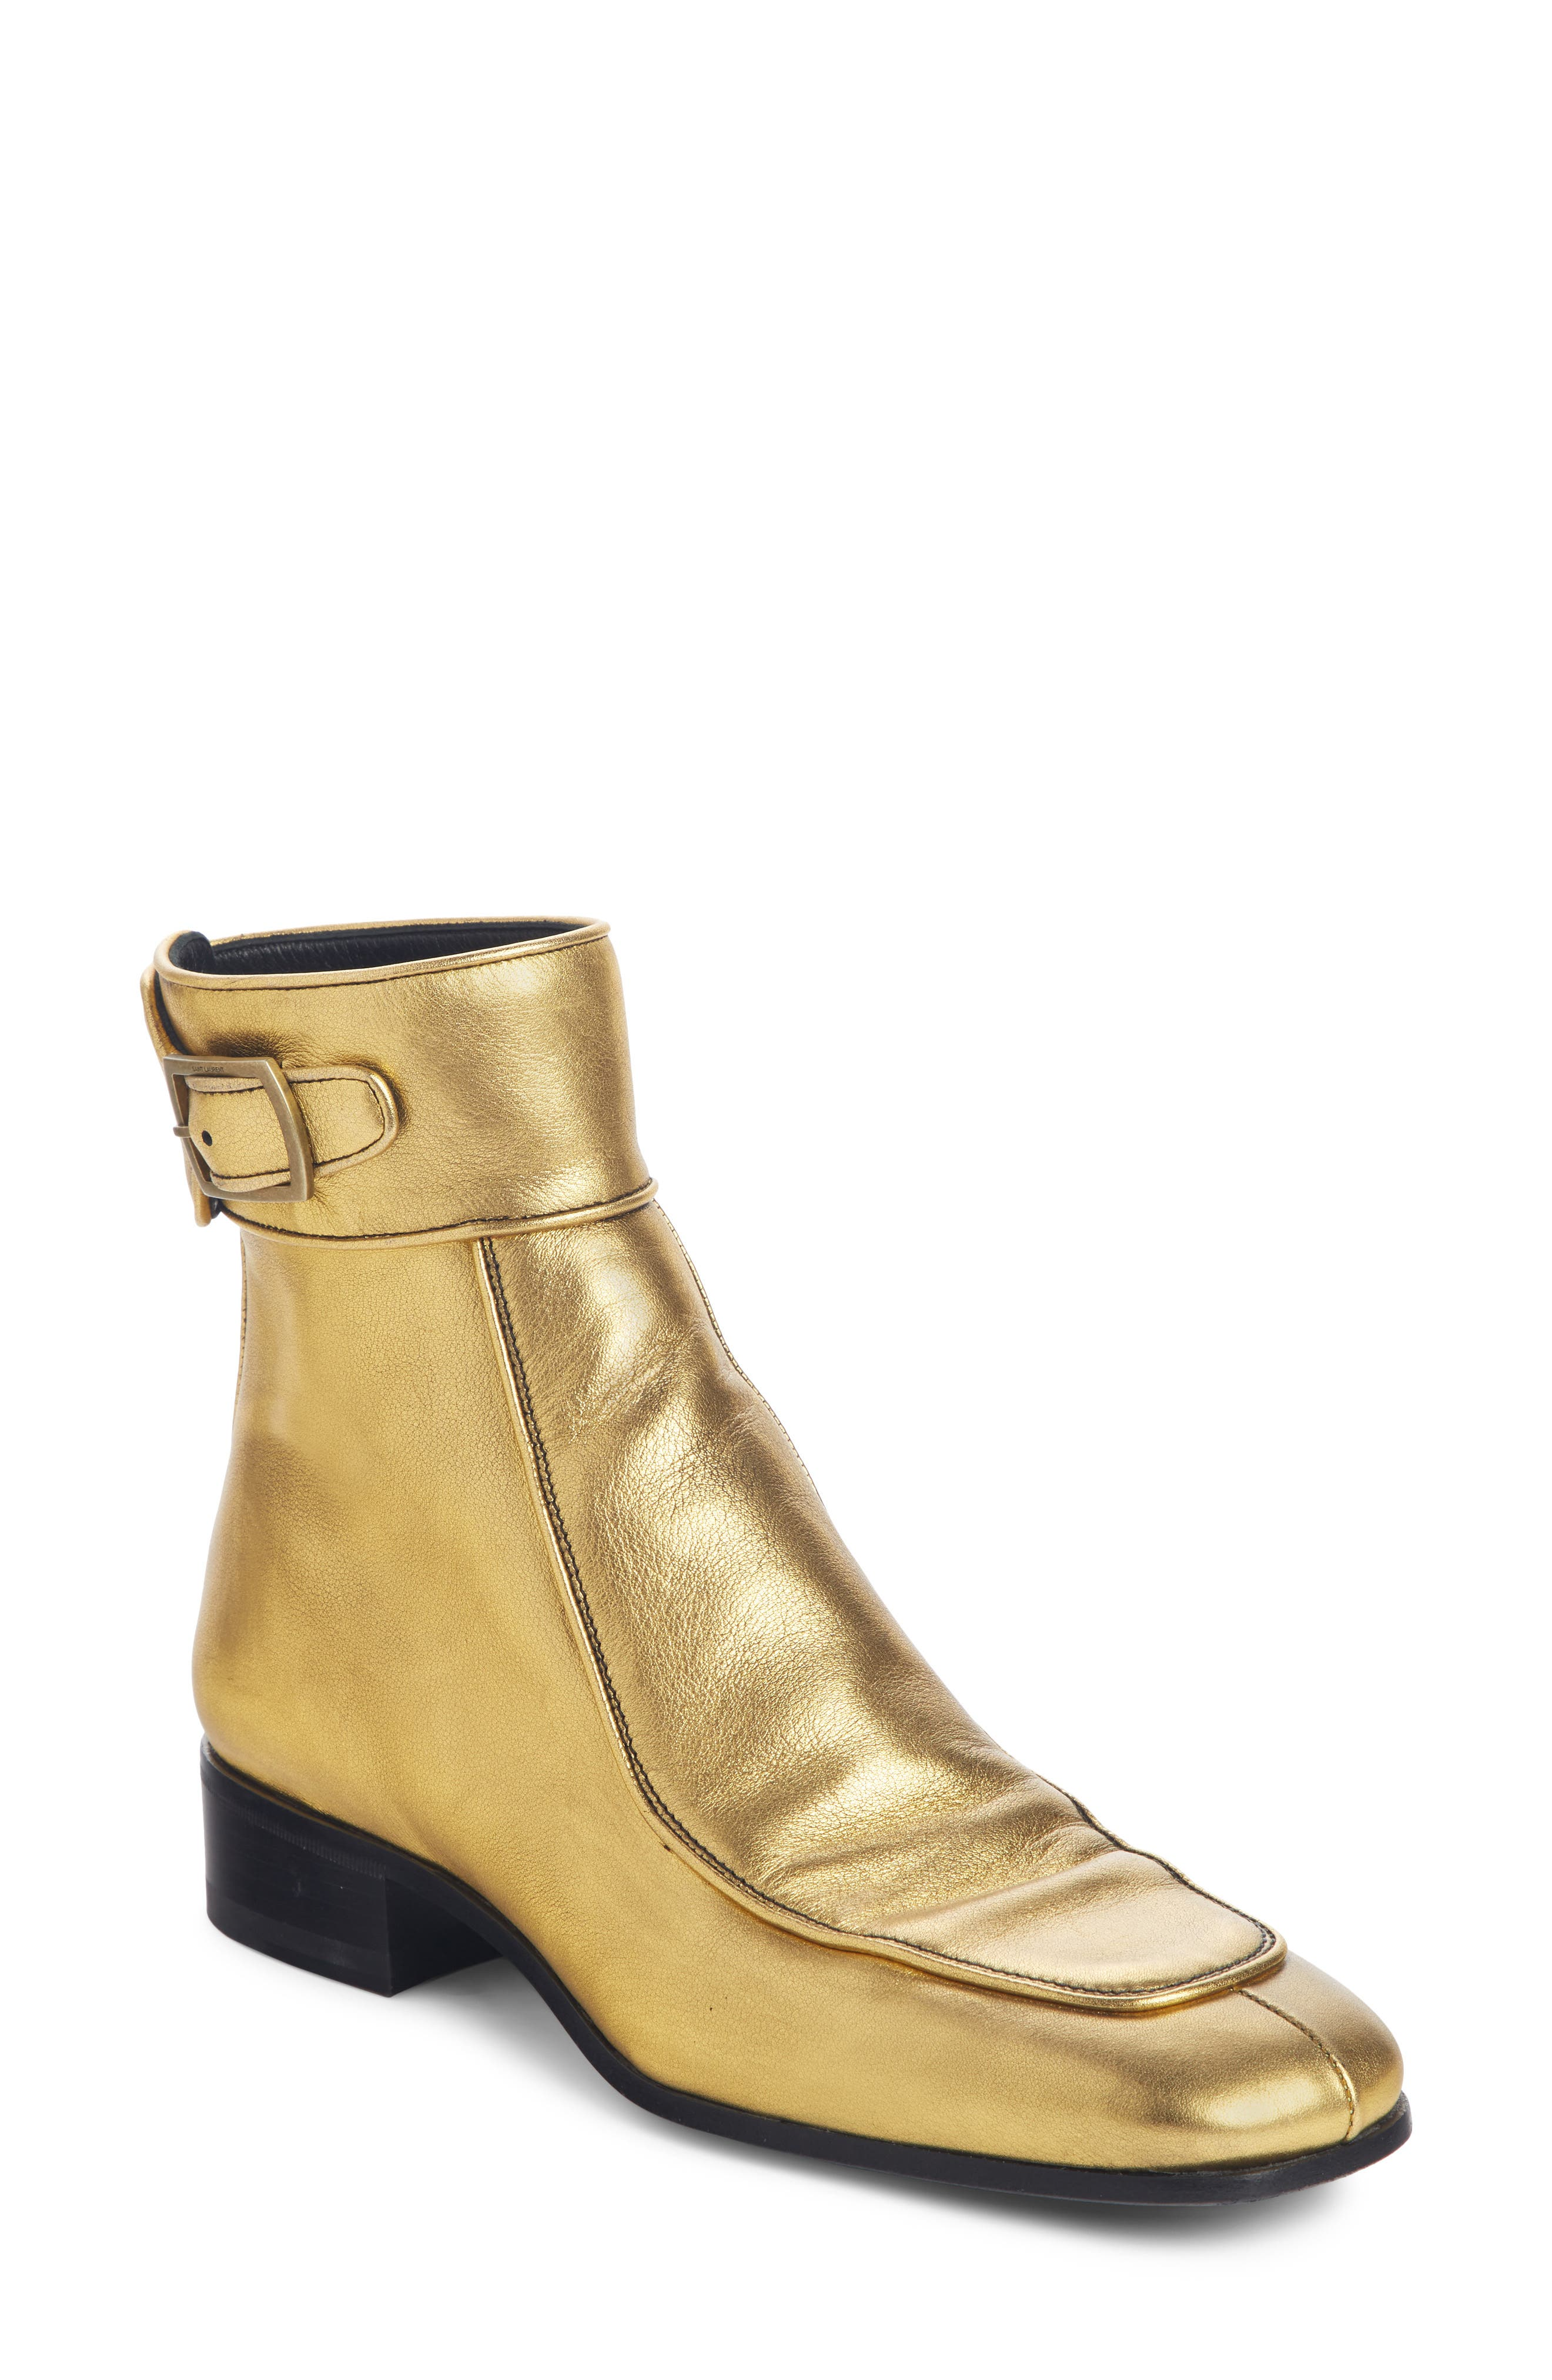 Saint Laurent Miles Buckle Cuff Boot - Metallic